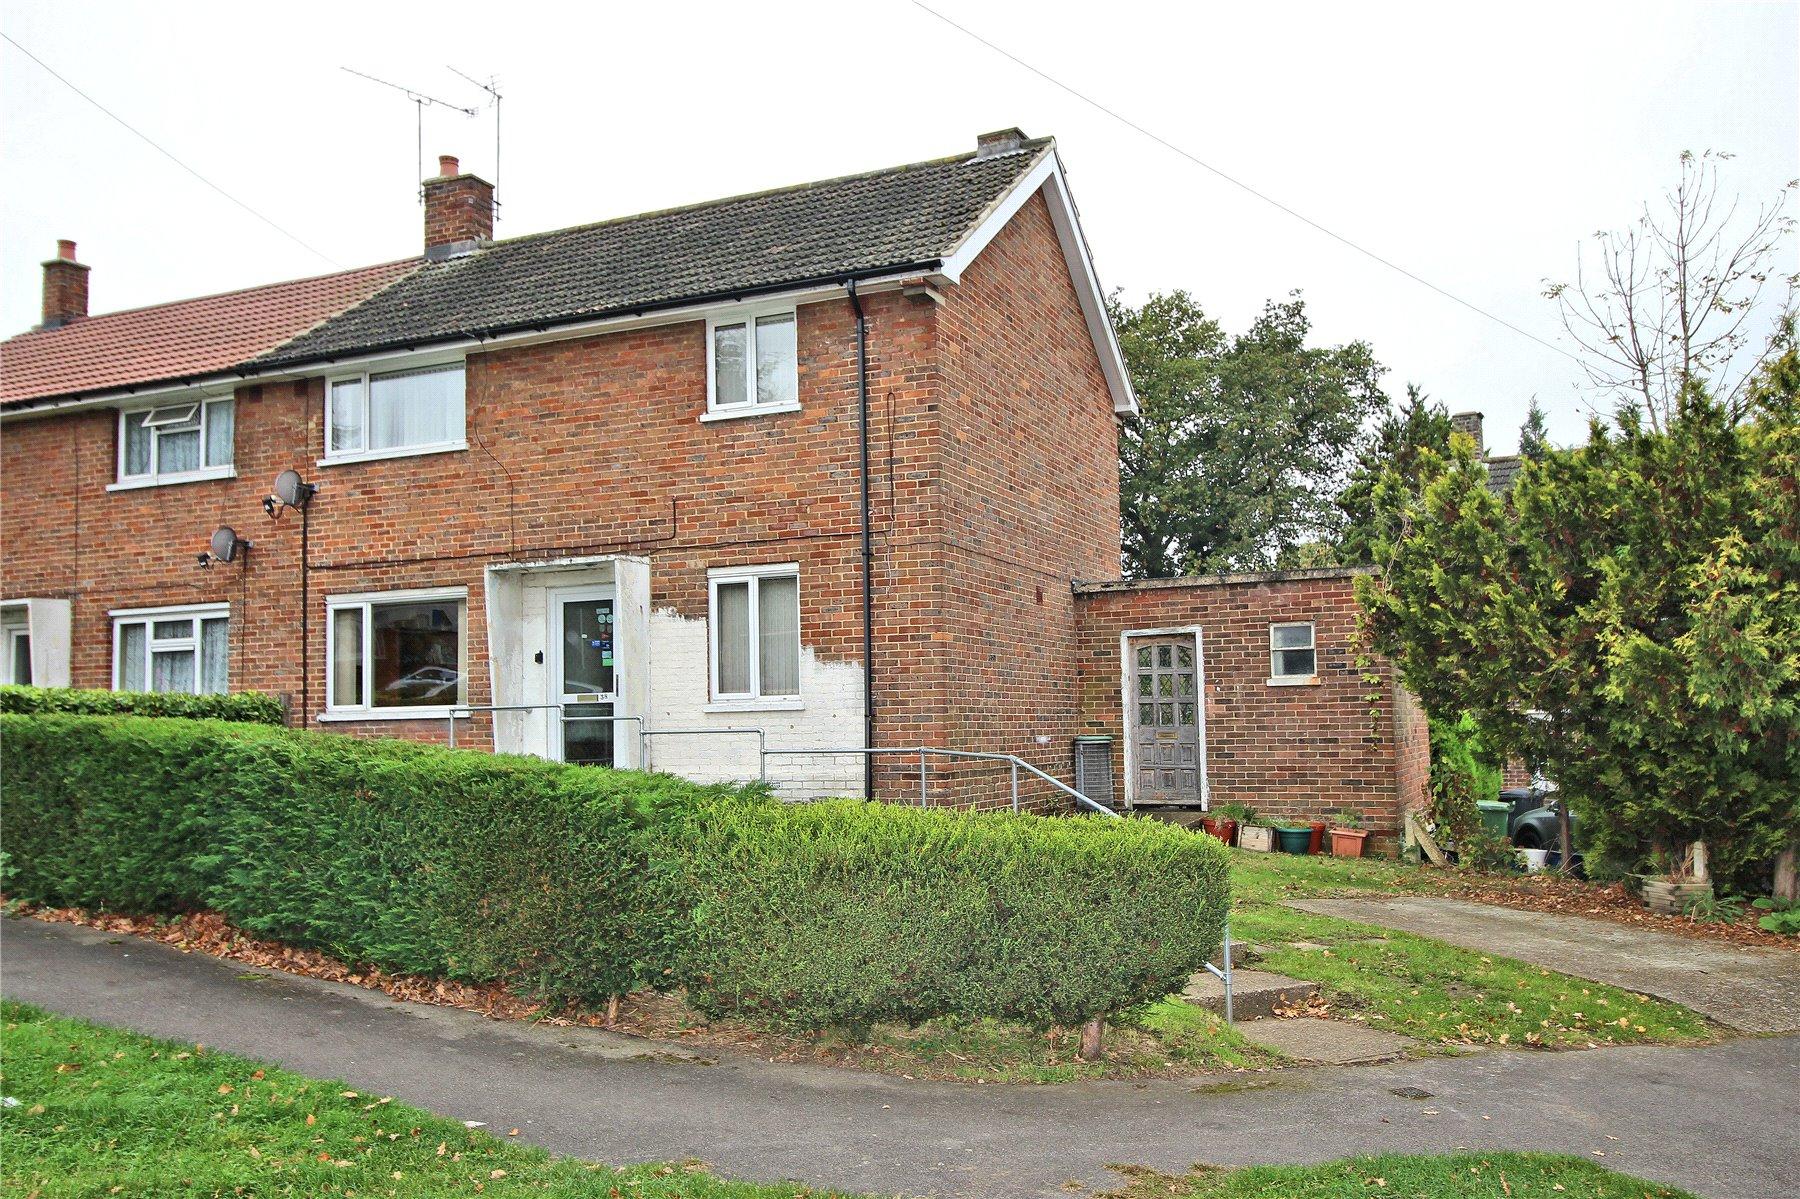 3 Bedrooms Semi Detached House for sale in Kent Road, Woking, Surrey, GU22